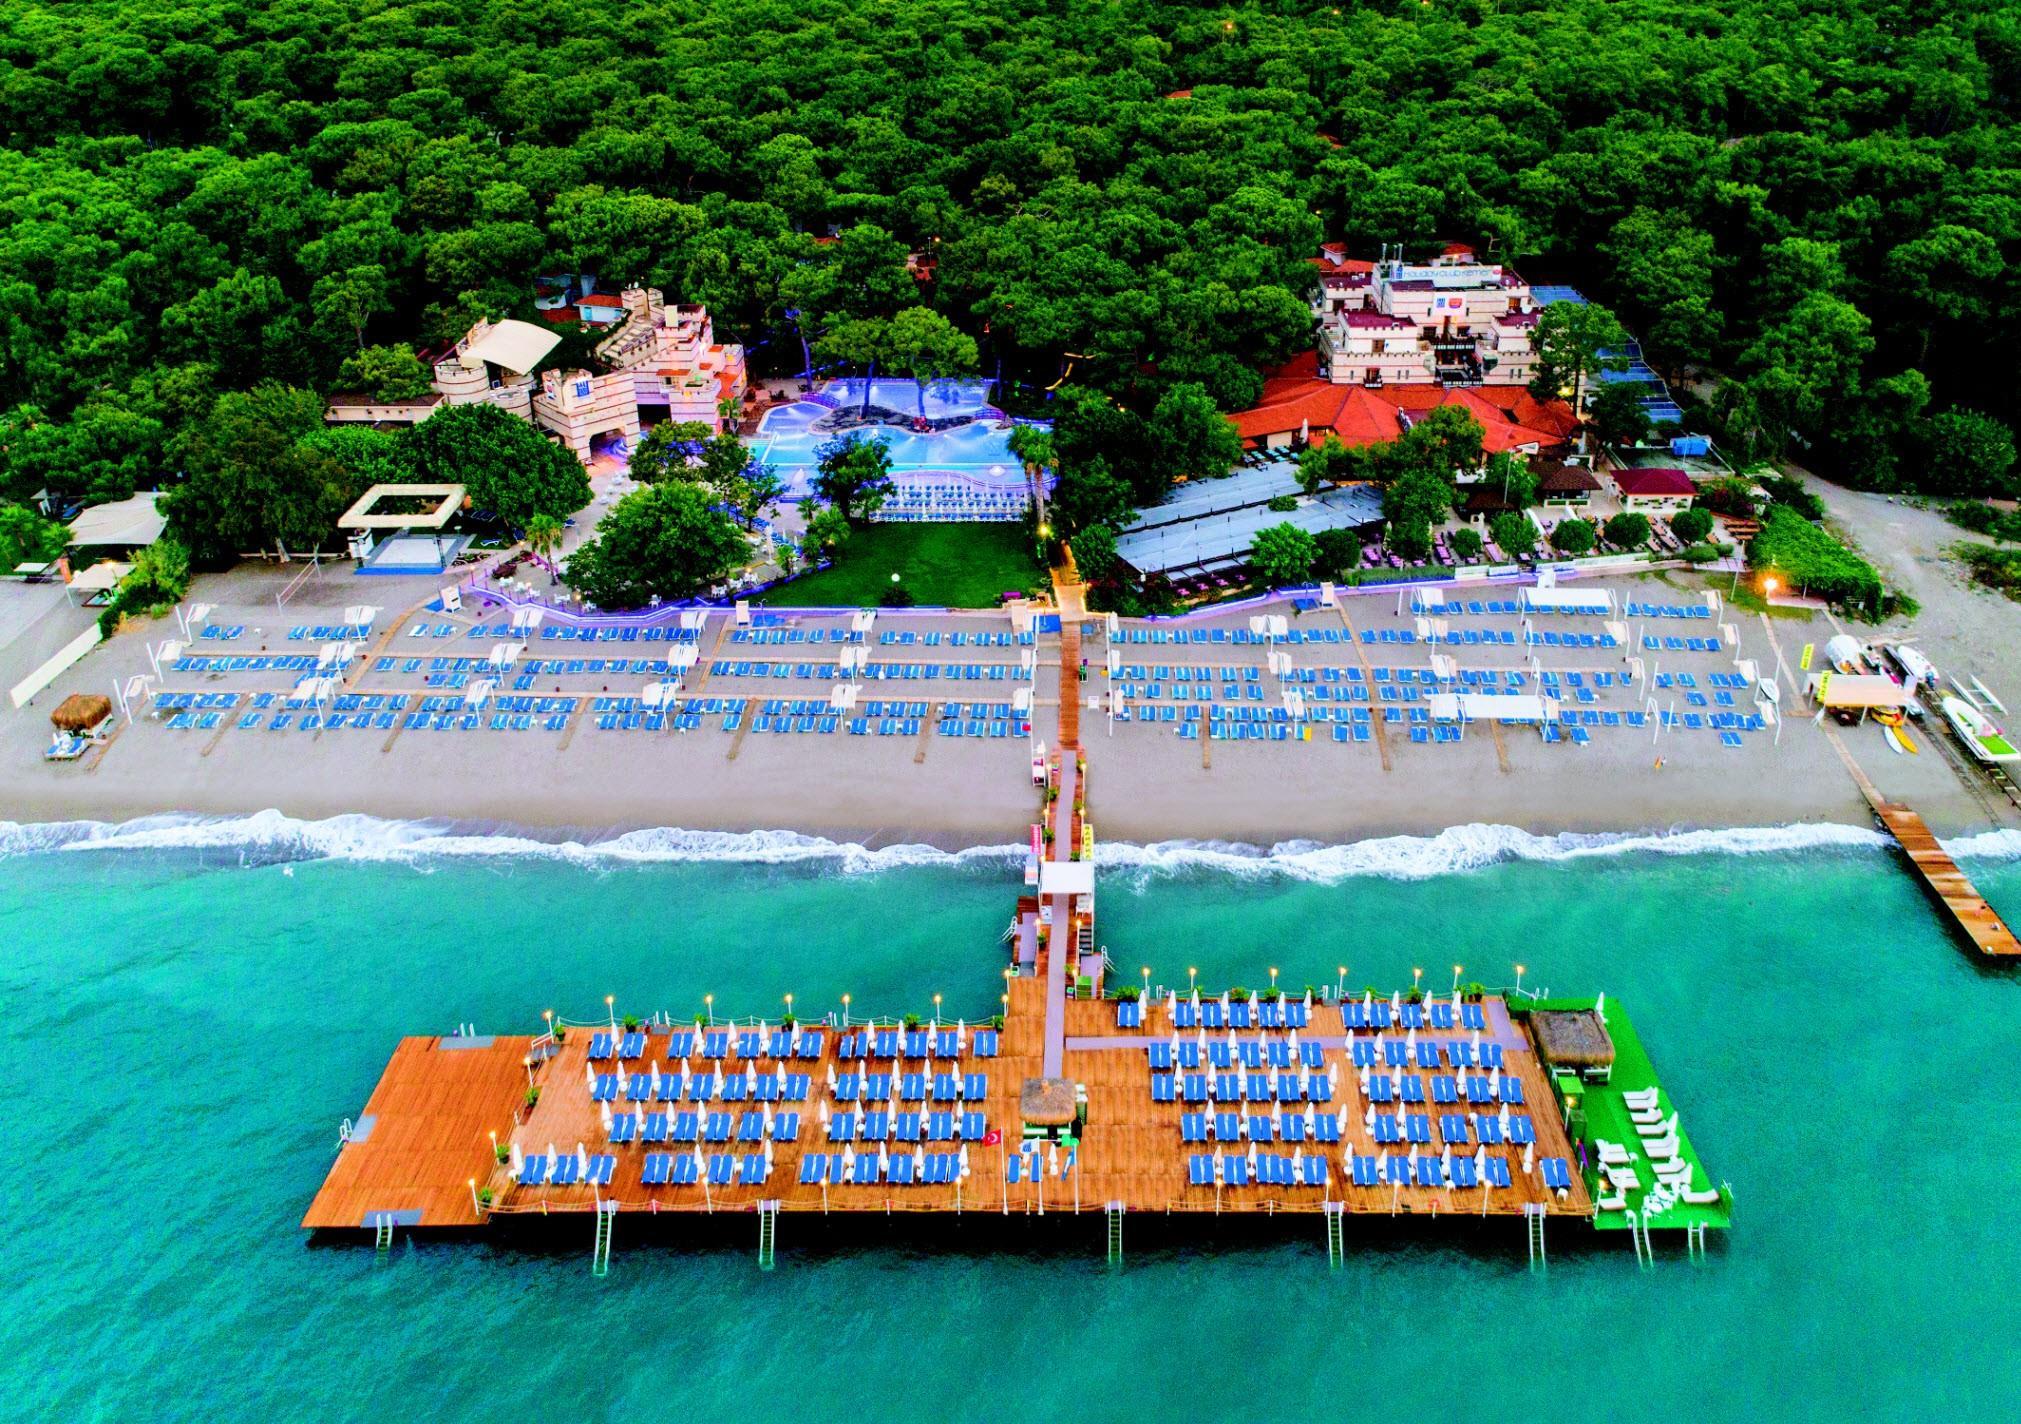 http://www.orextravel.sk/OREX/hotelphotos/ulusoy-kemer-holiday-club-area-004.jpg